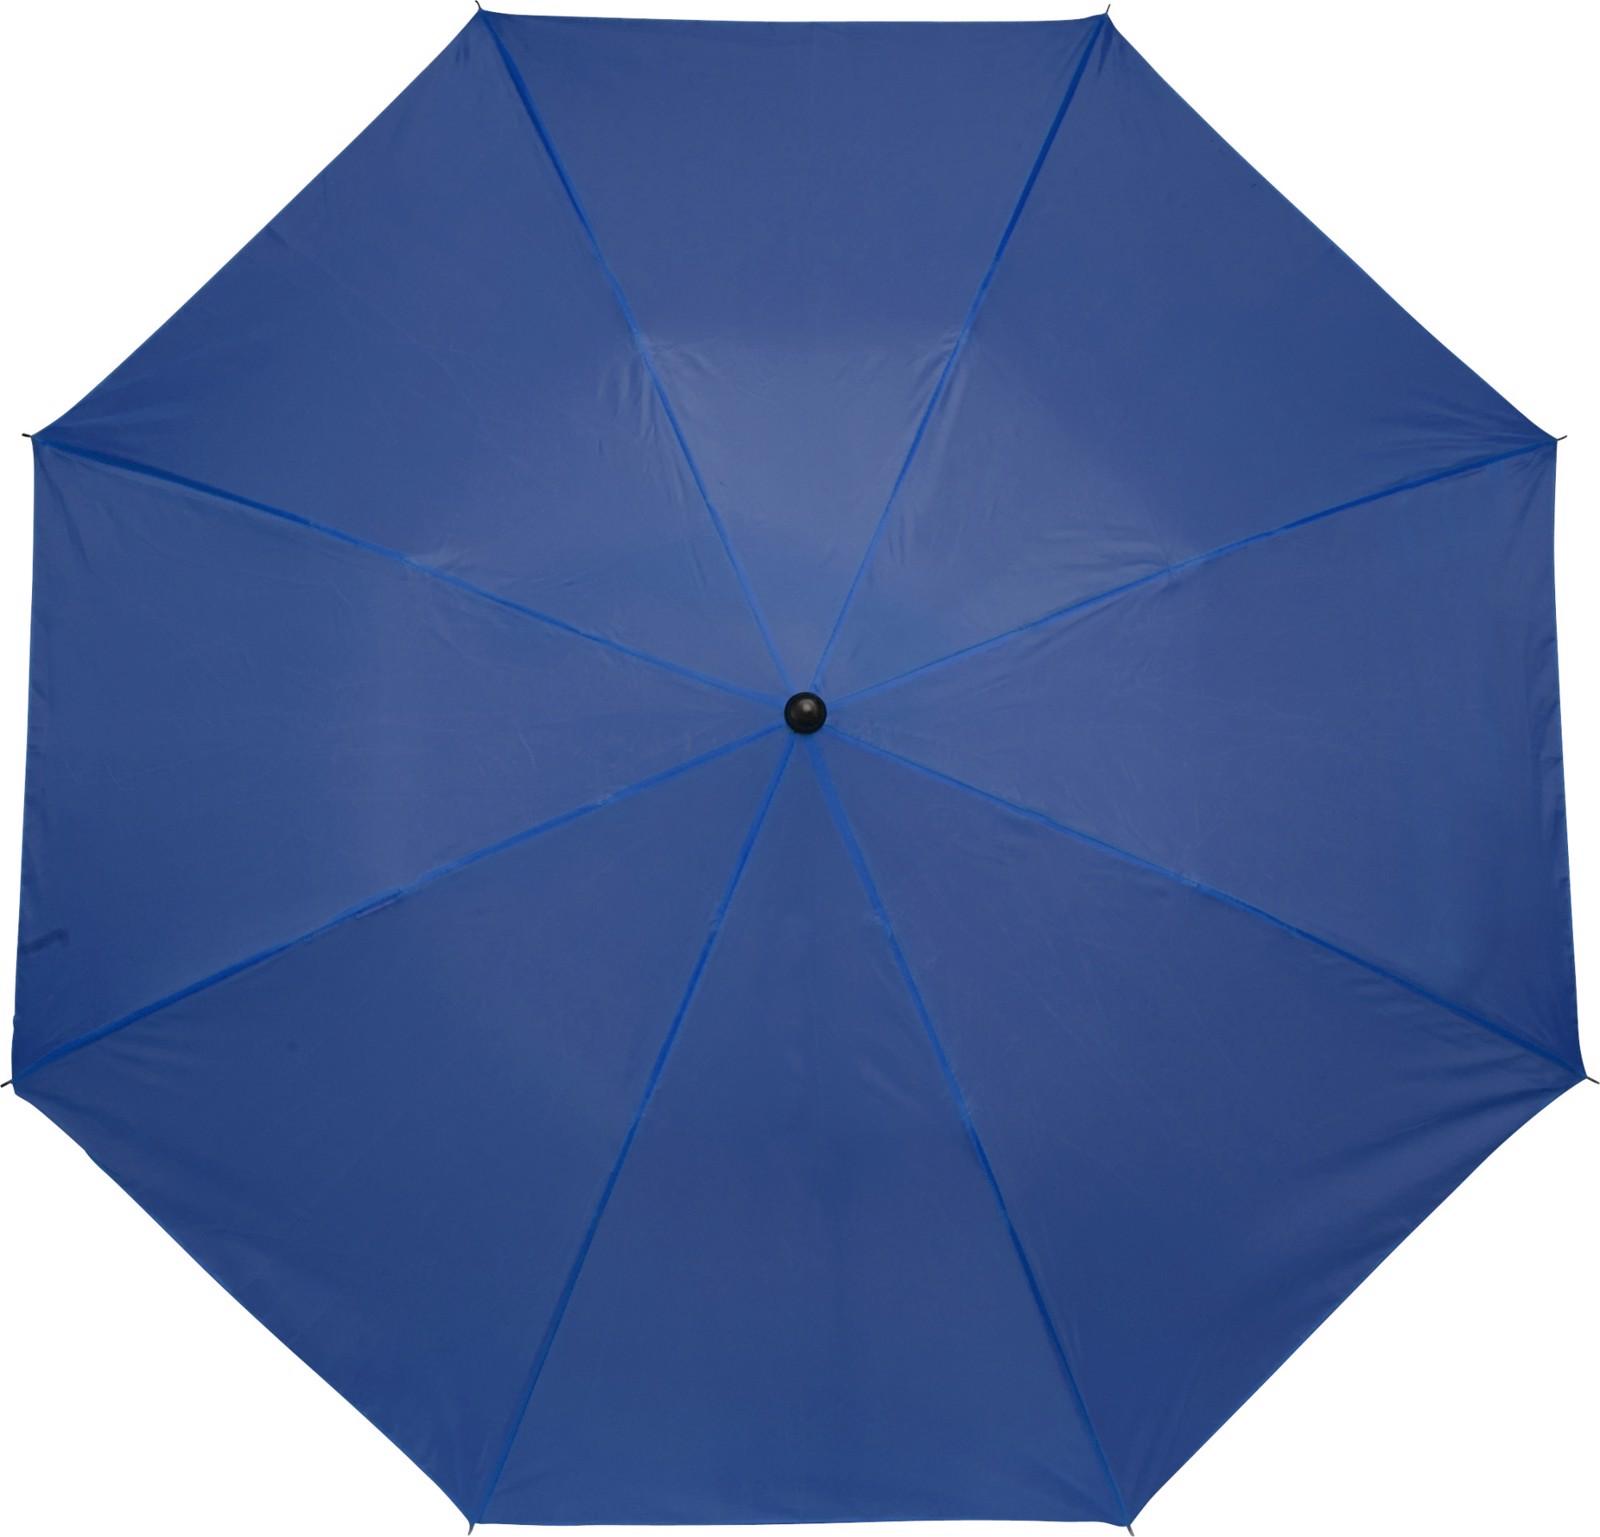 Polyester (190T) umbrella - Cobalt Blue